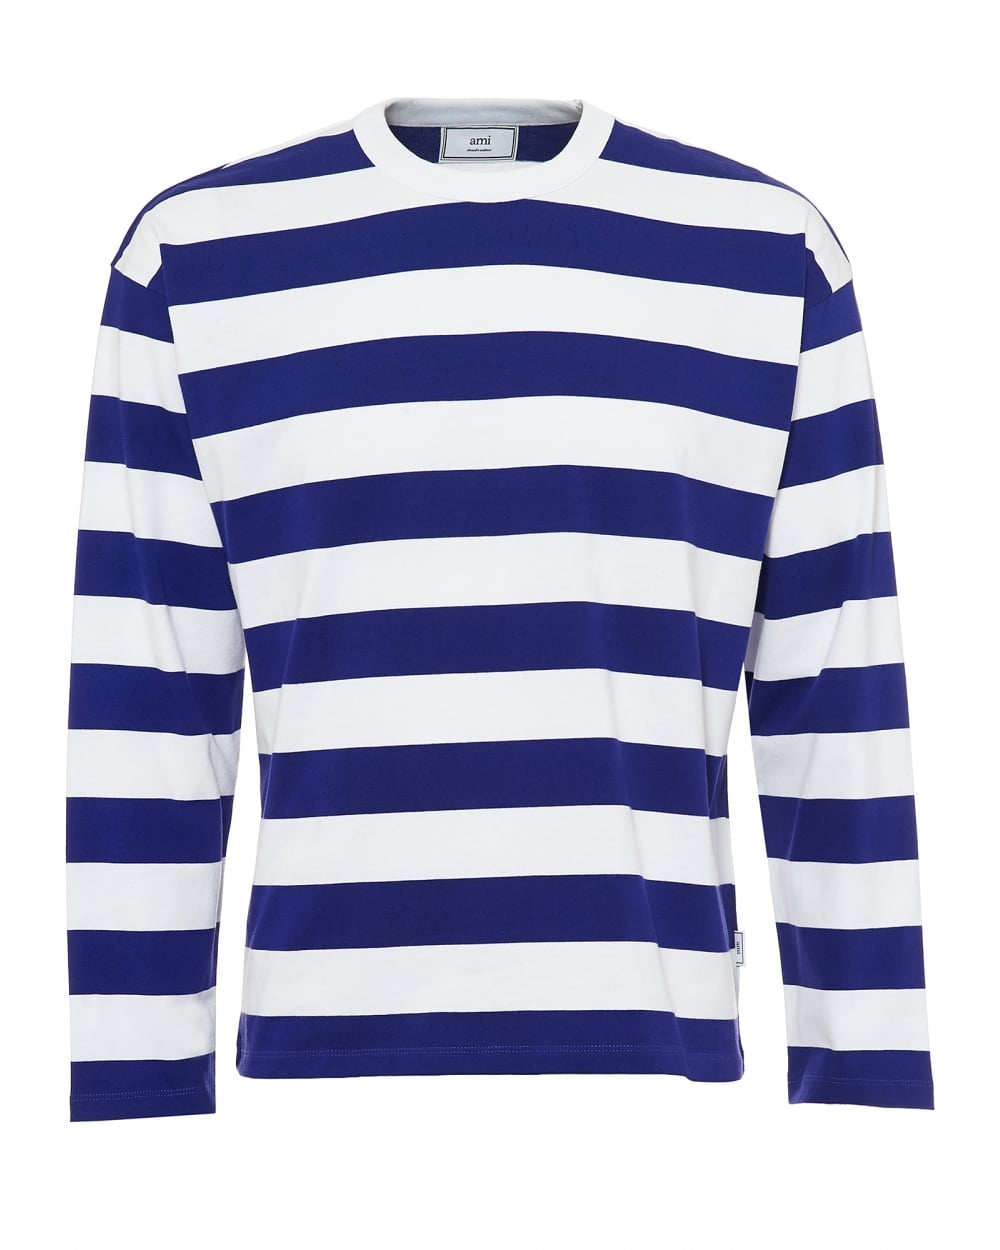 a858c2ed0e2502 Ami Mens Striped Sweatshirt